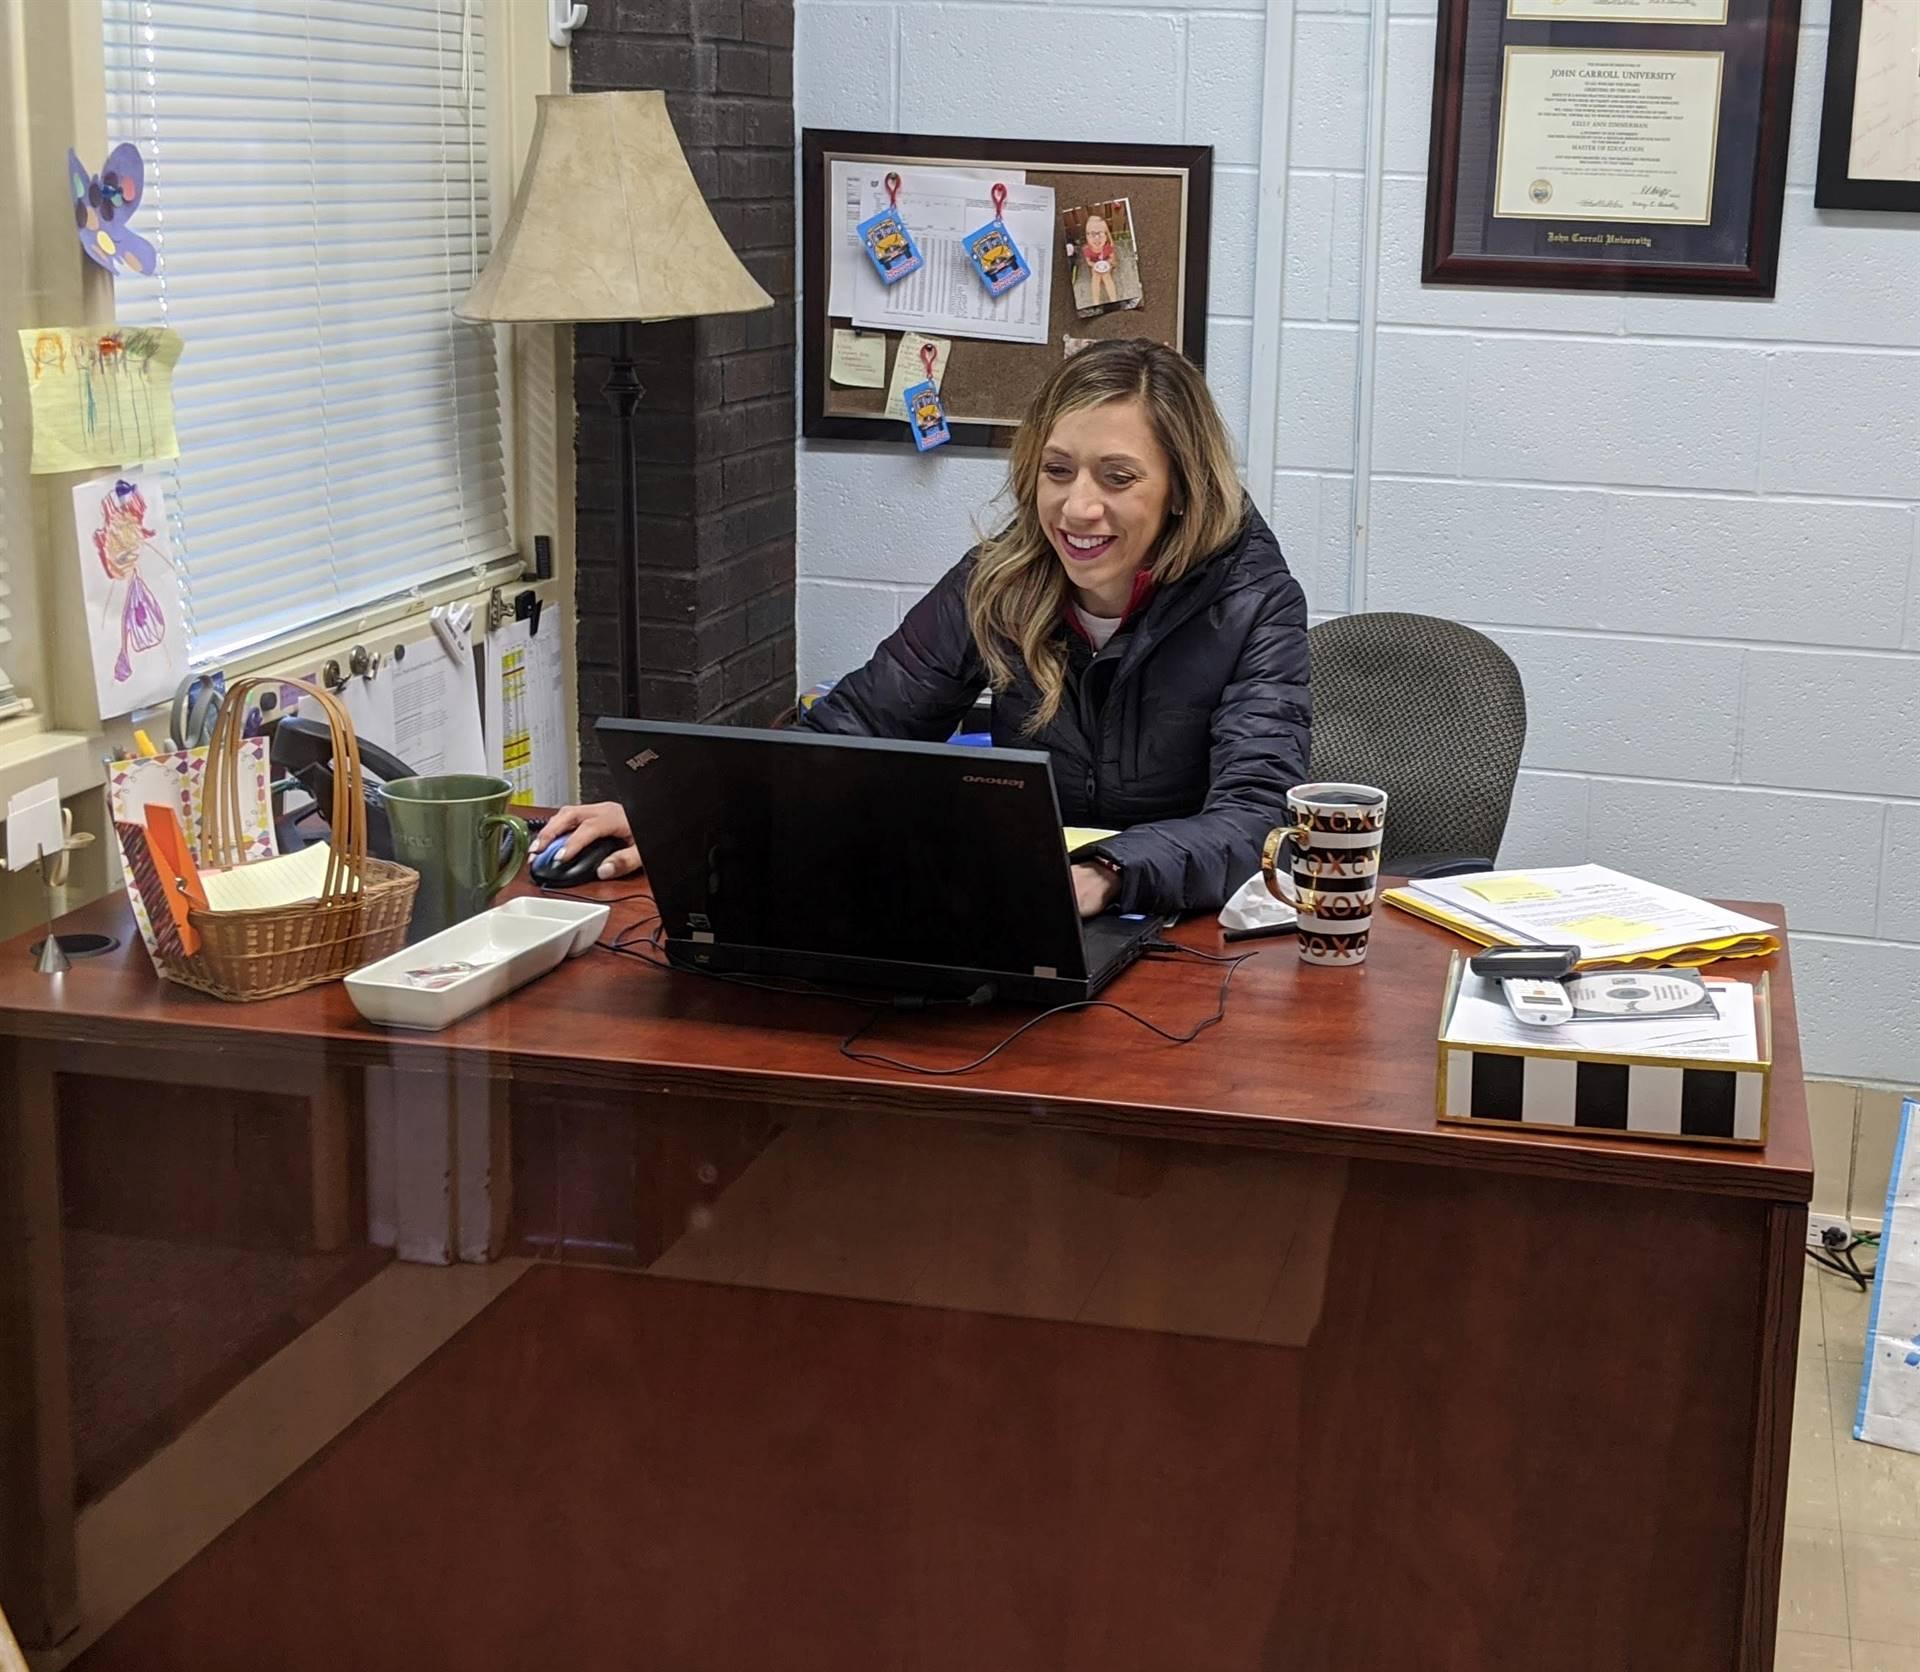 District Curriculum Supervisor Dr. Kelly Moran